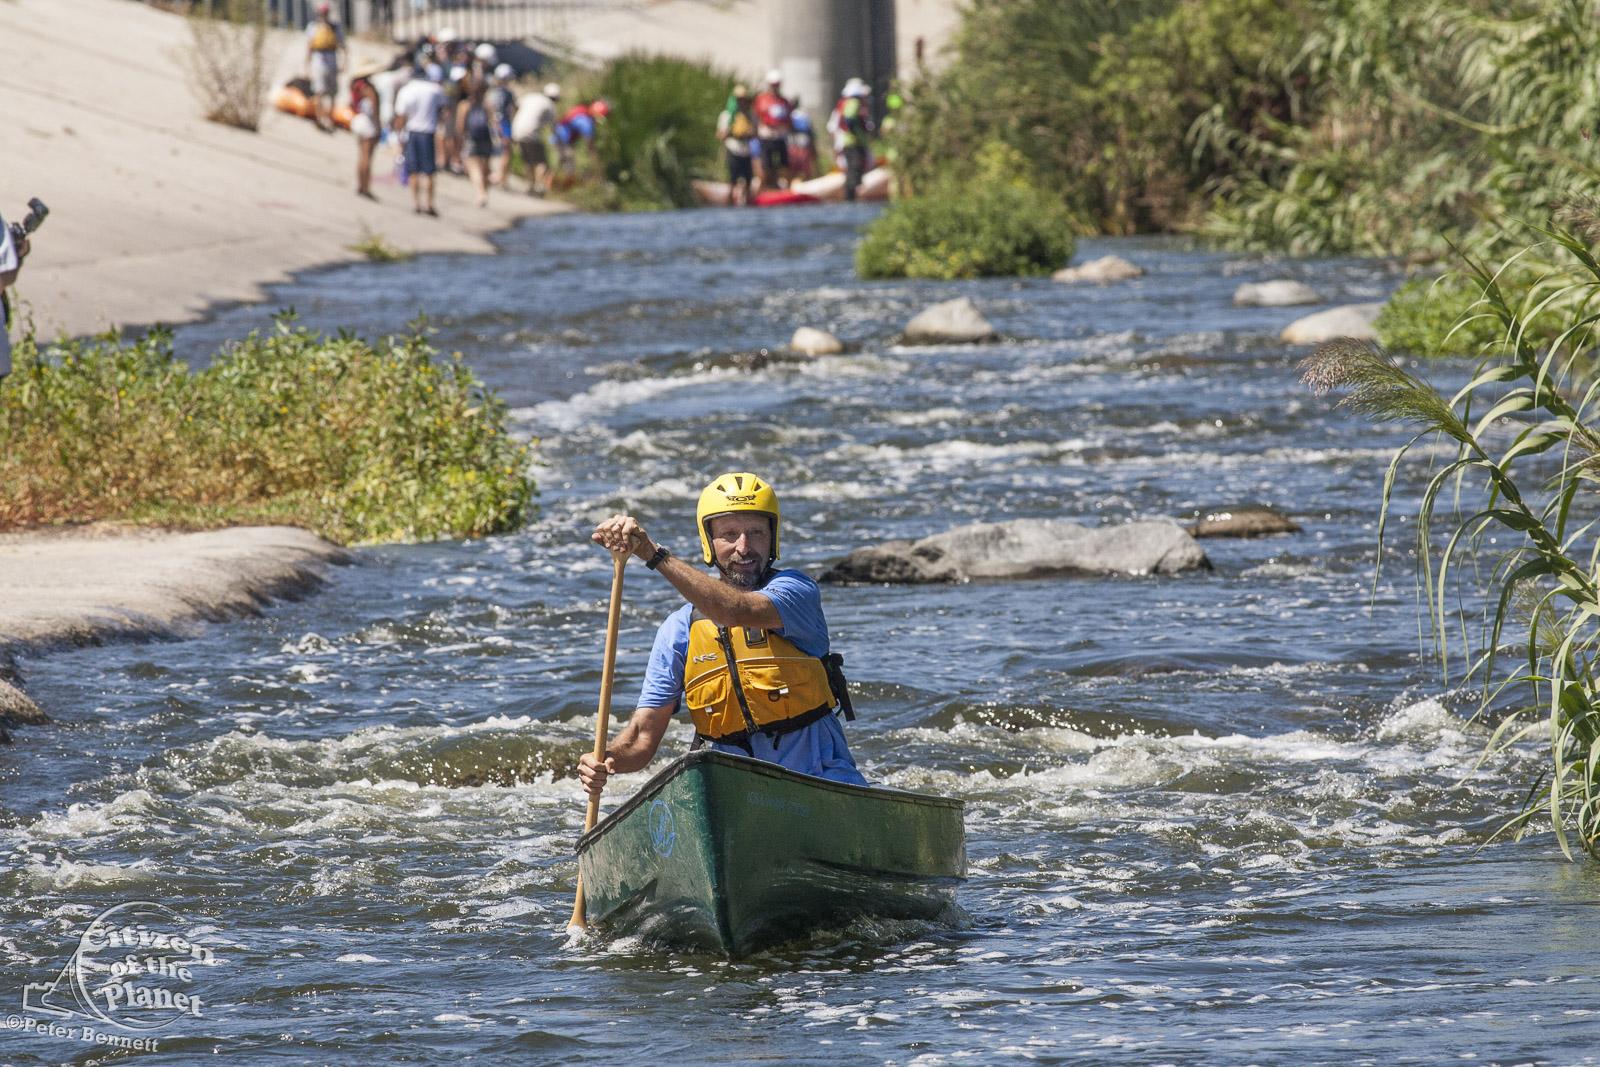 US_CA_48_3867_la_river_boat_race.jpg